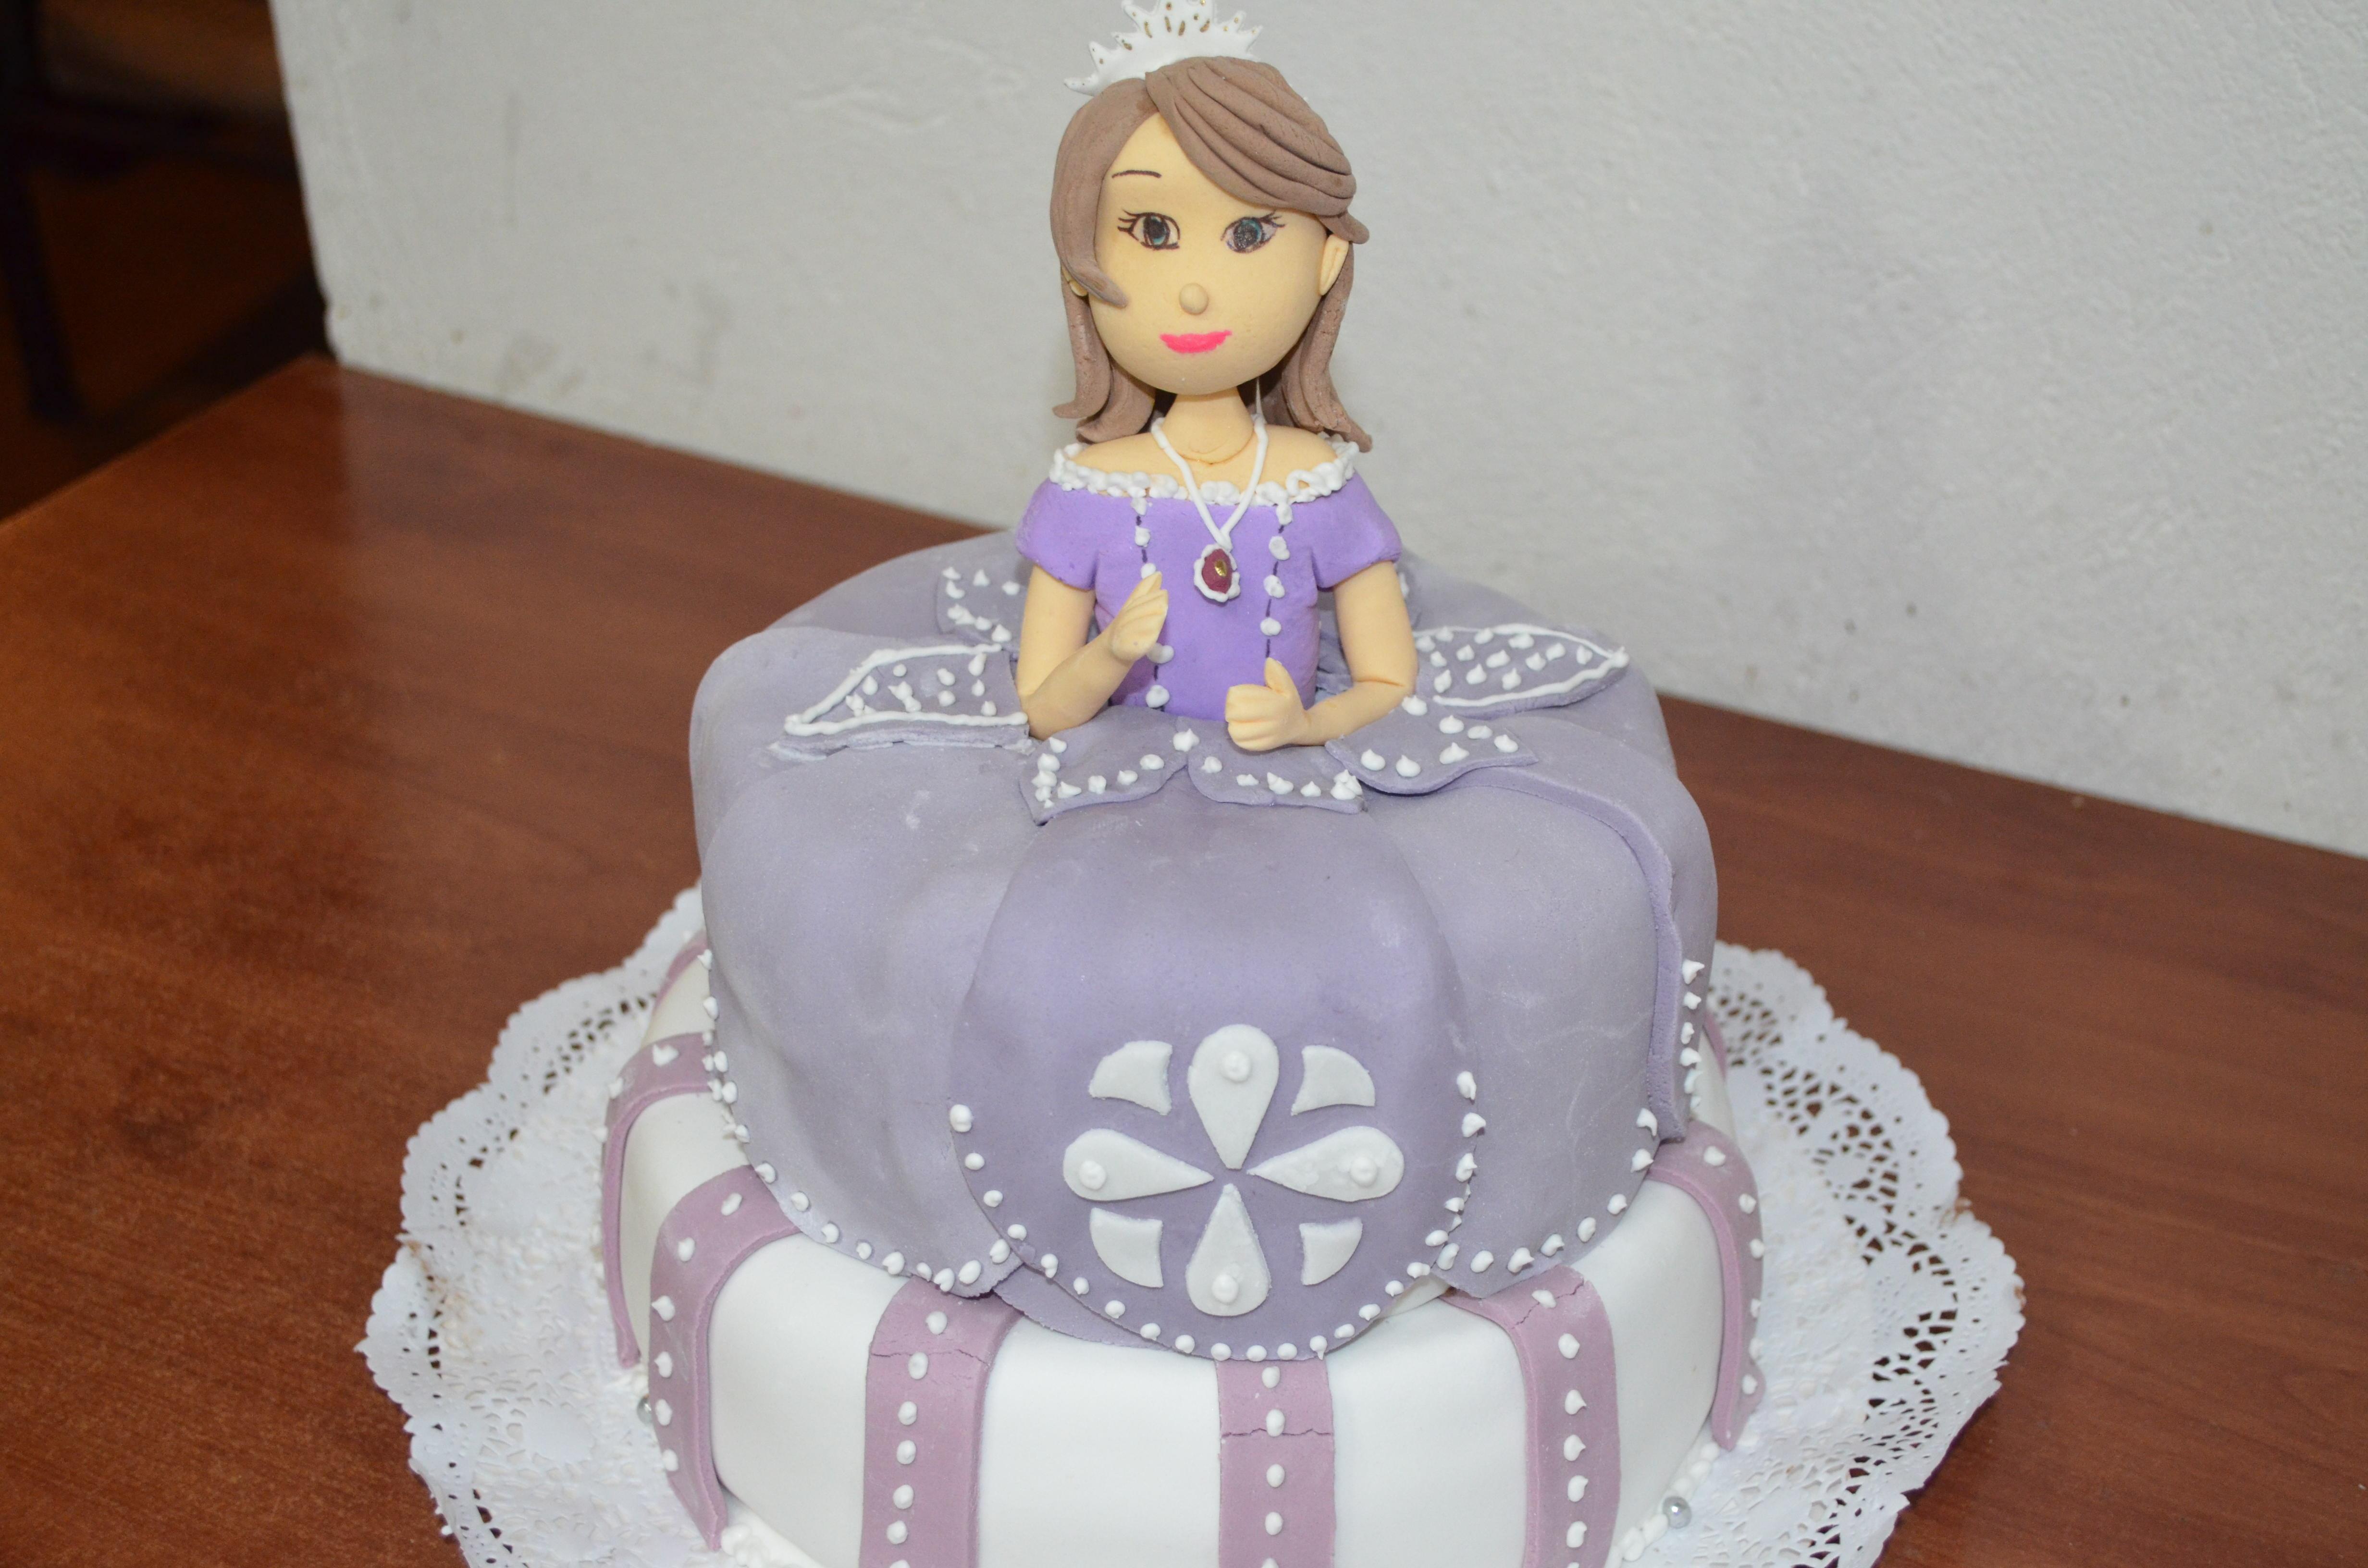 Torta Princesa Sofia De Fondant Pastillaje Para Cumpleaños Pictures